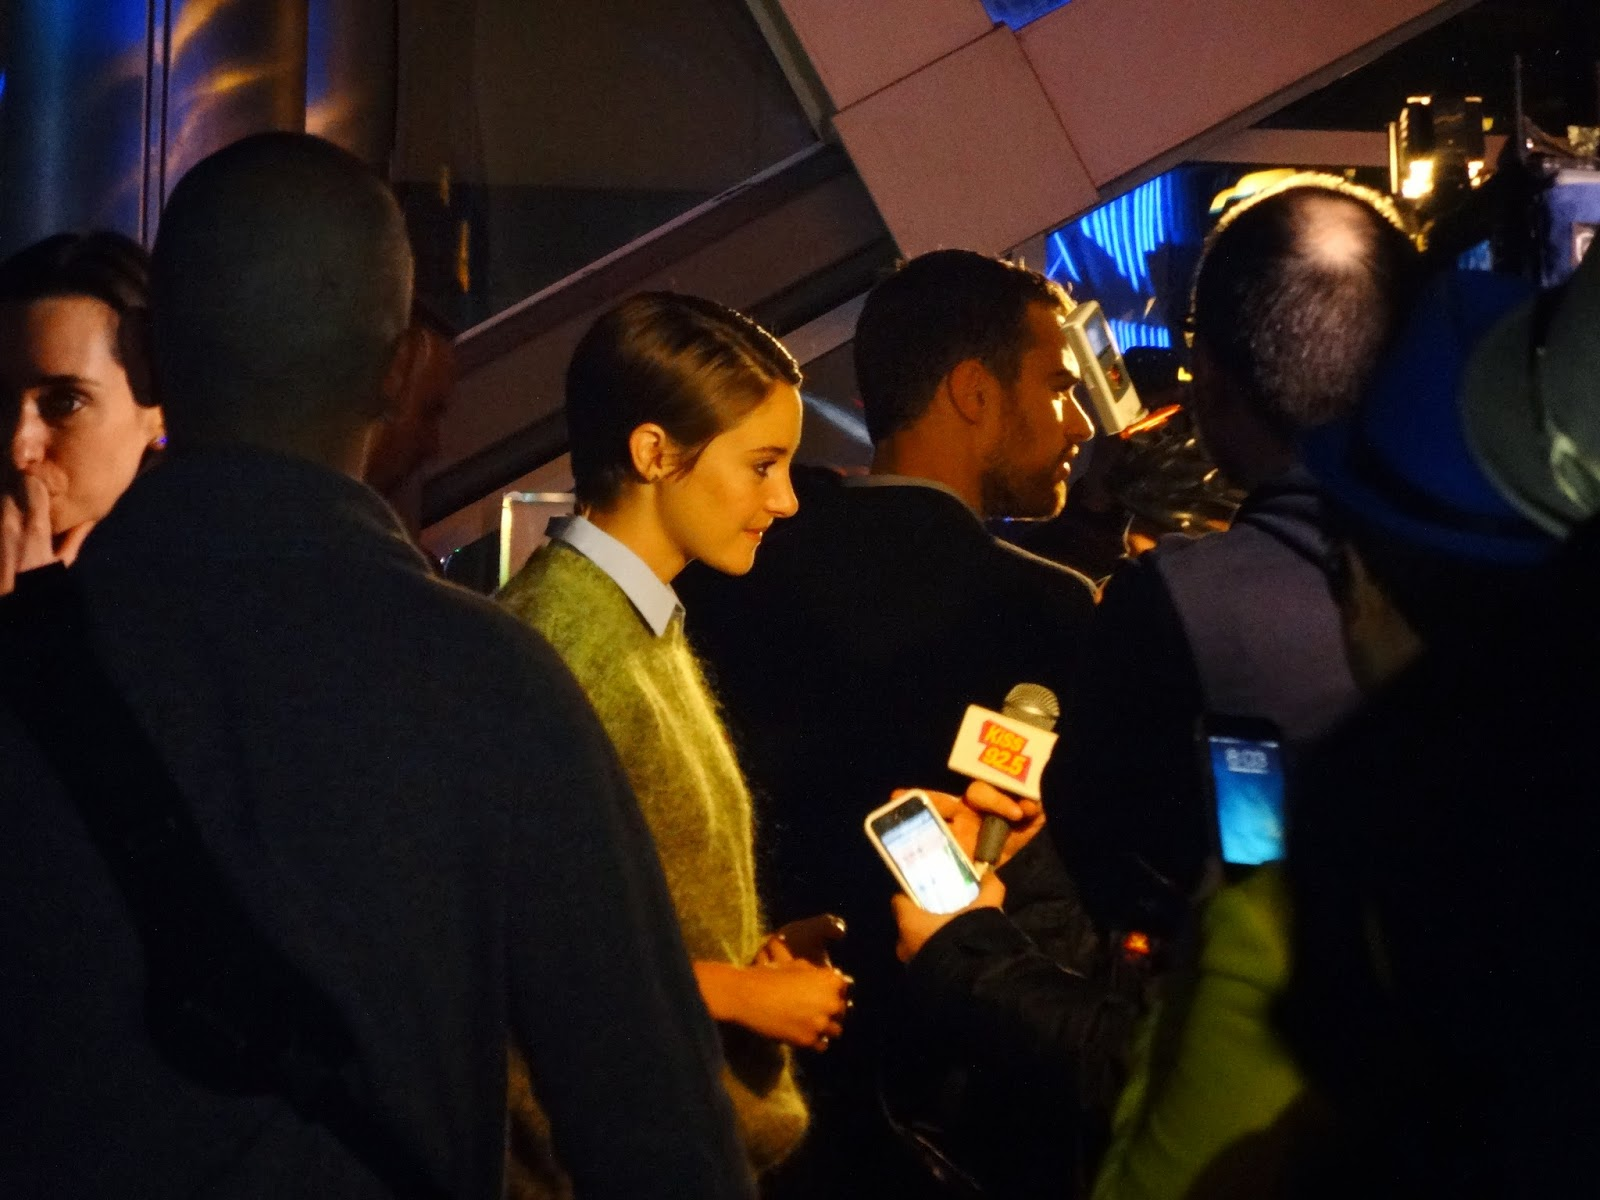 Theo James, Divergent, Divergent Toronto, Divergent Premiere, Shailene Woodley